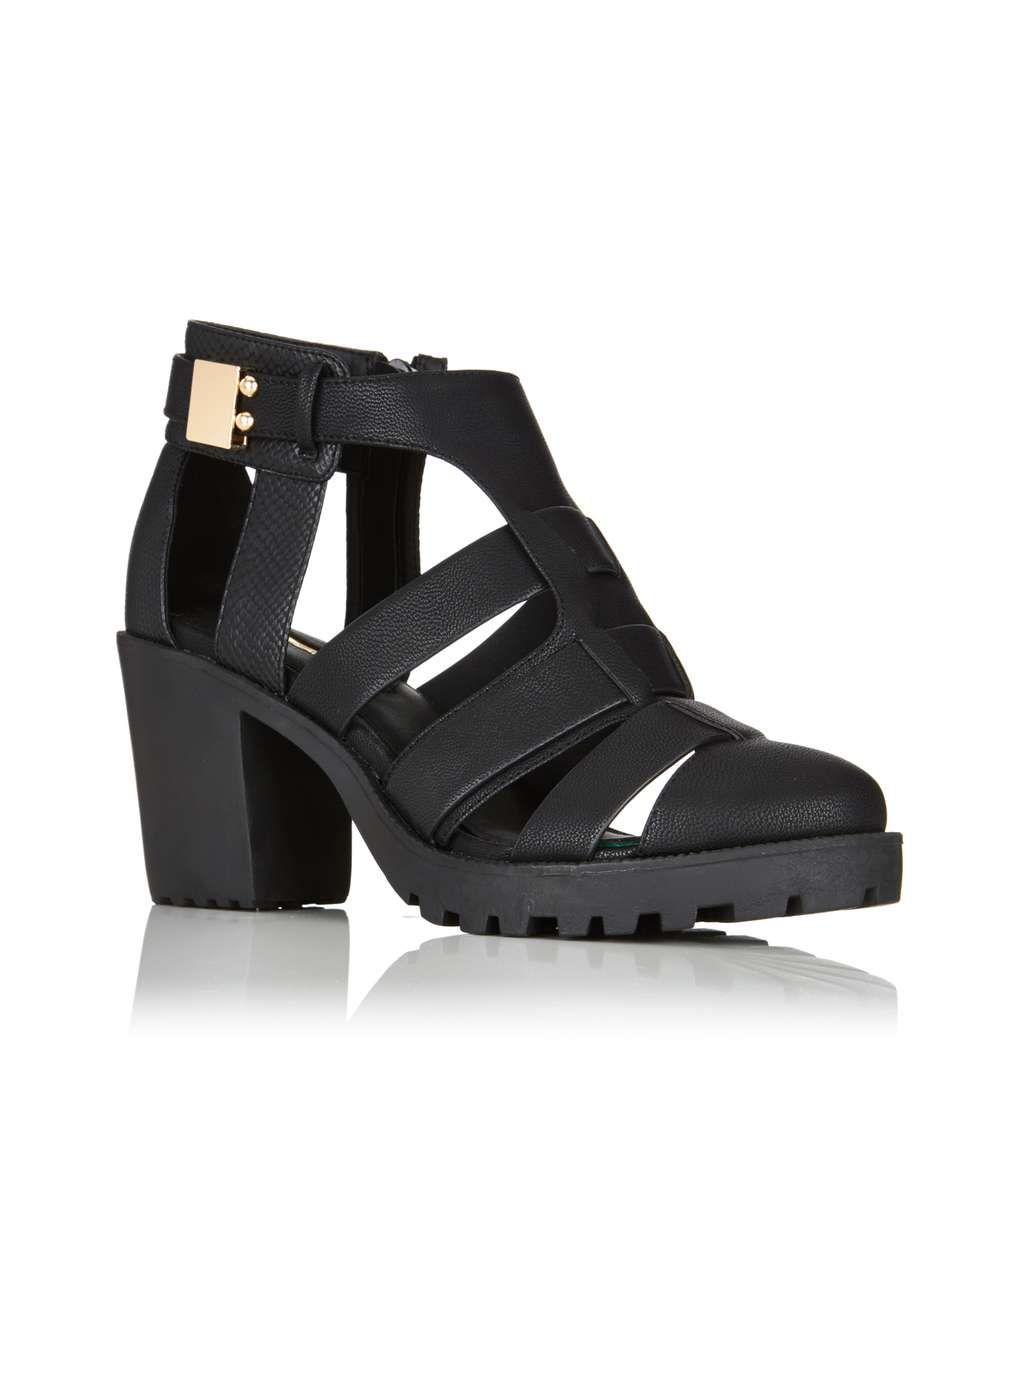 FLOCK cleated shoe - Shoes- Miss Selfridge